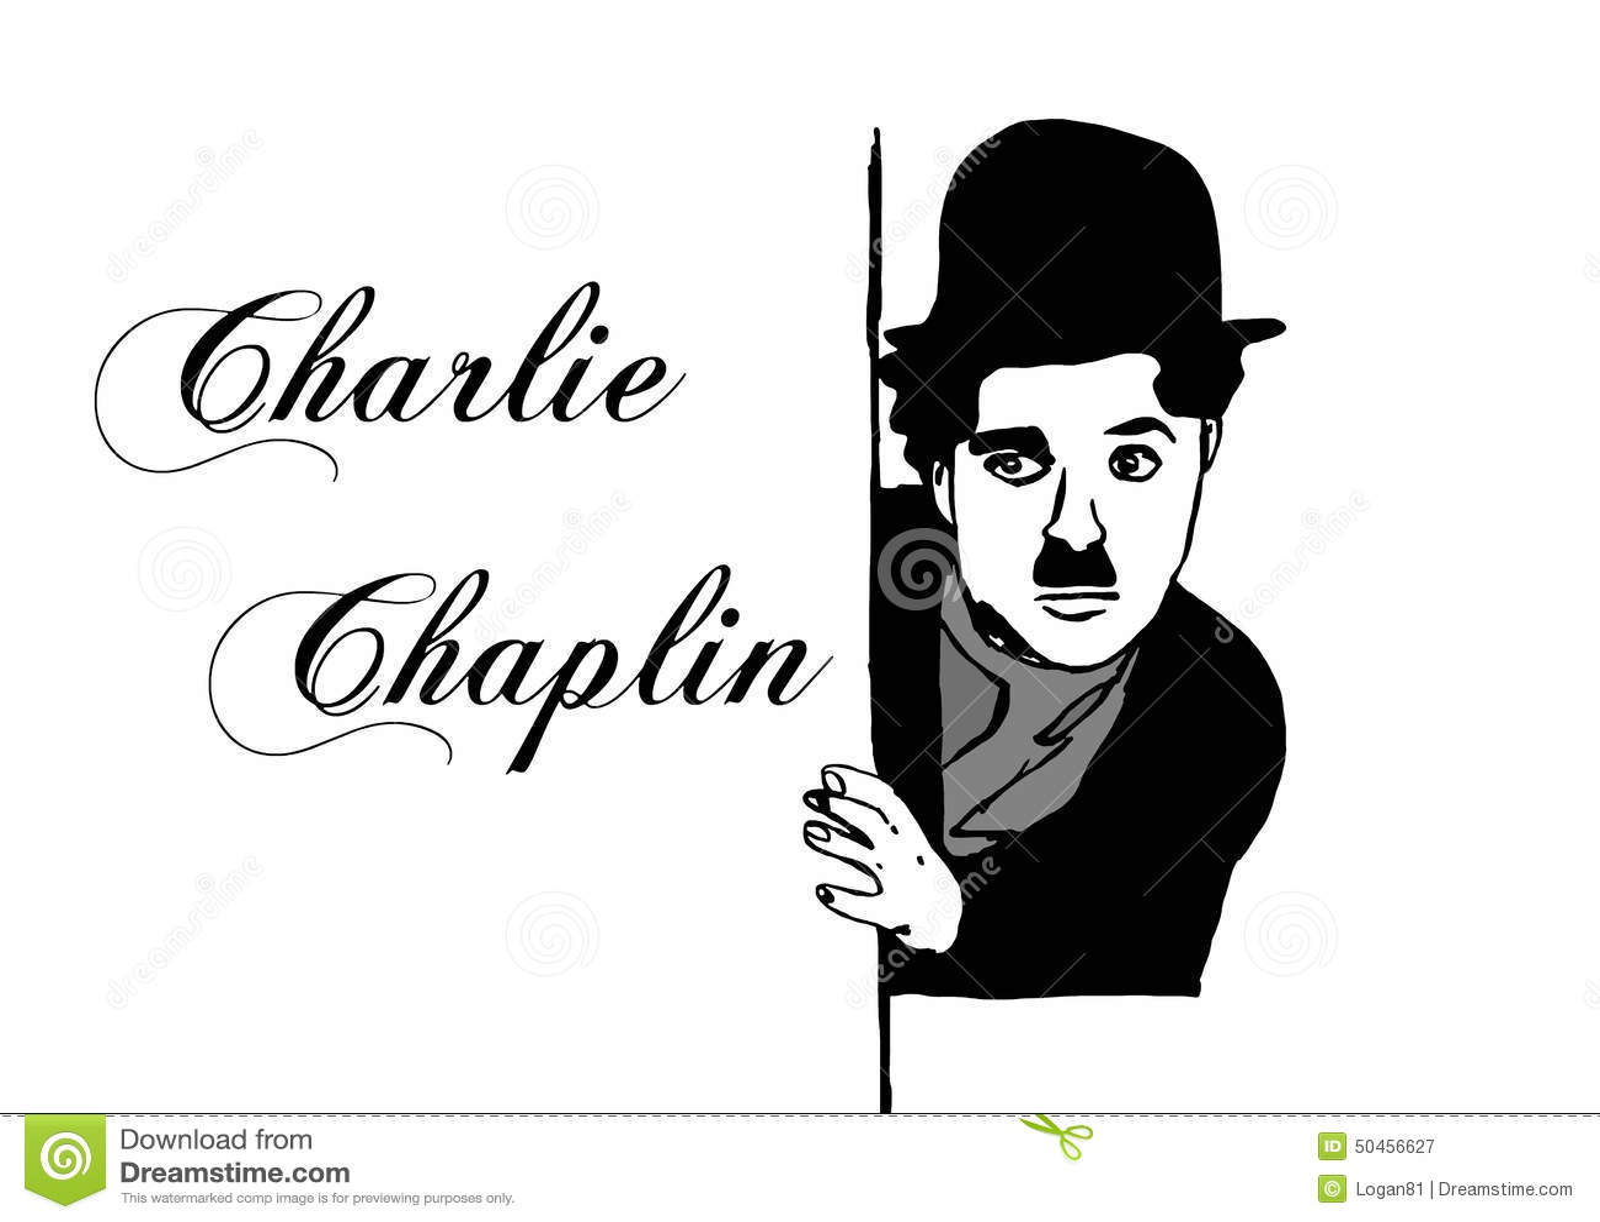 sight gags and charlie chaplin essay